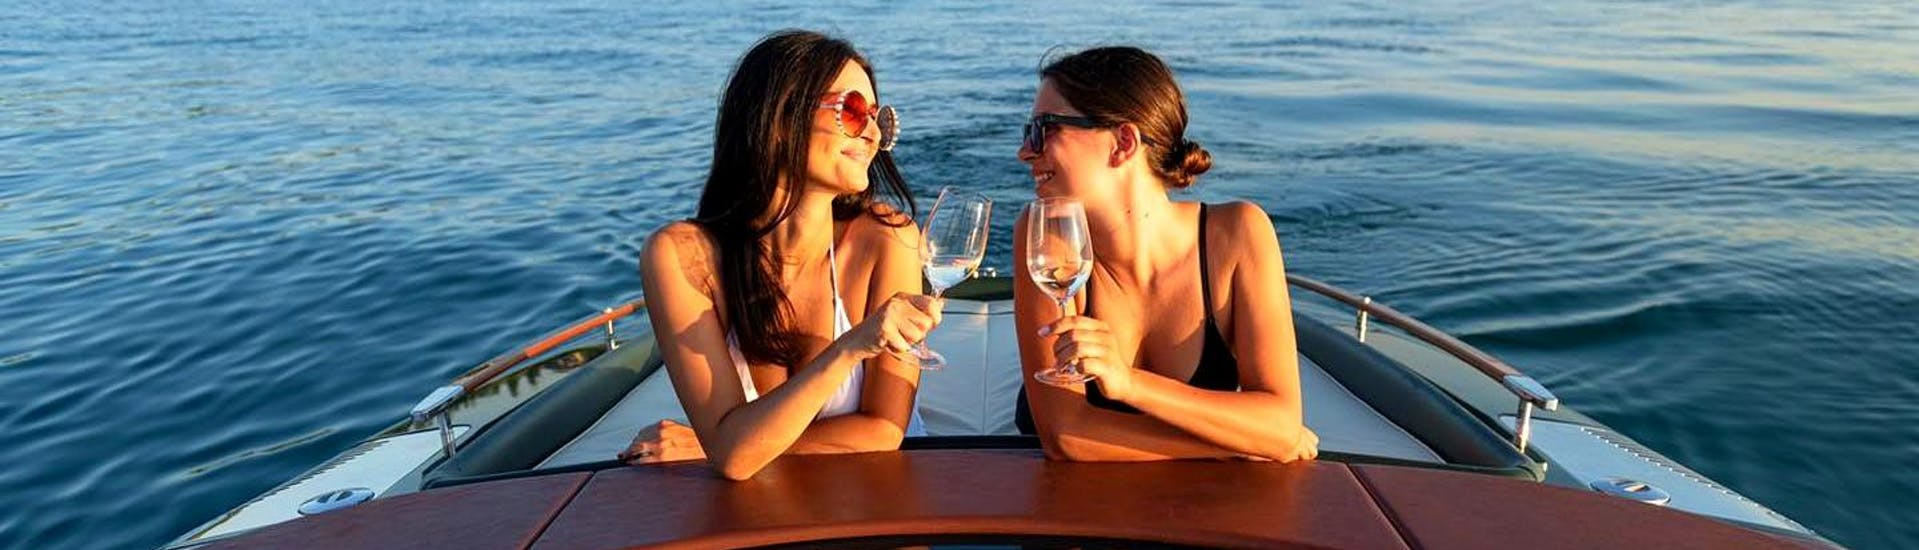 sunset-boat-trip-along-sirmione-peninsula-sirmione-boats-hero